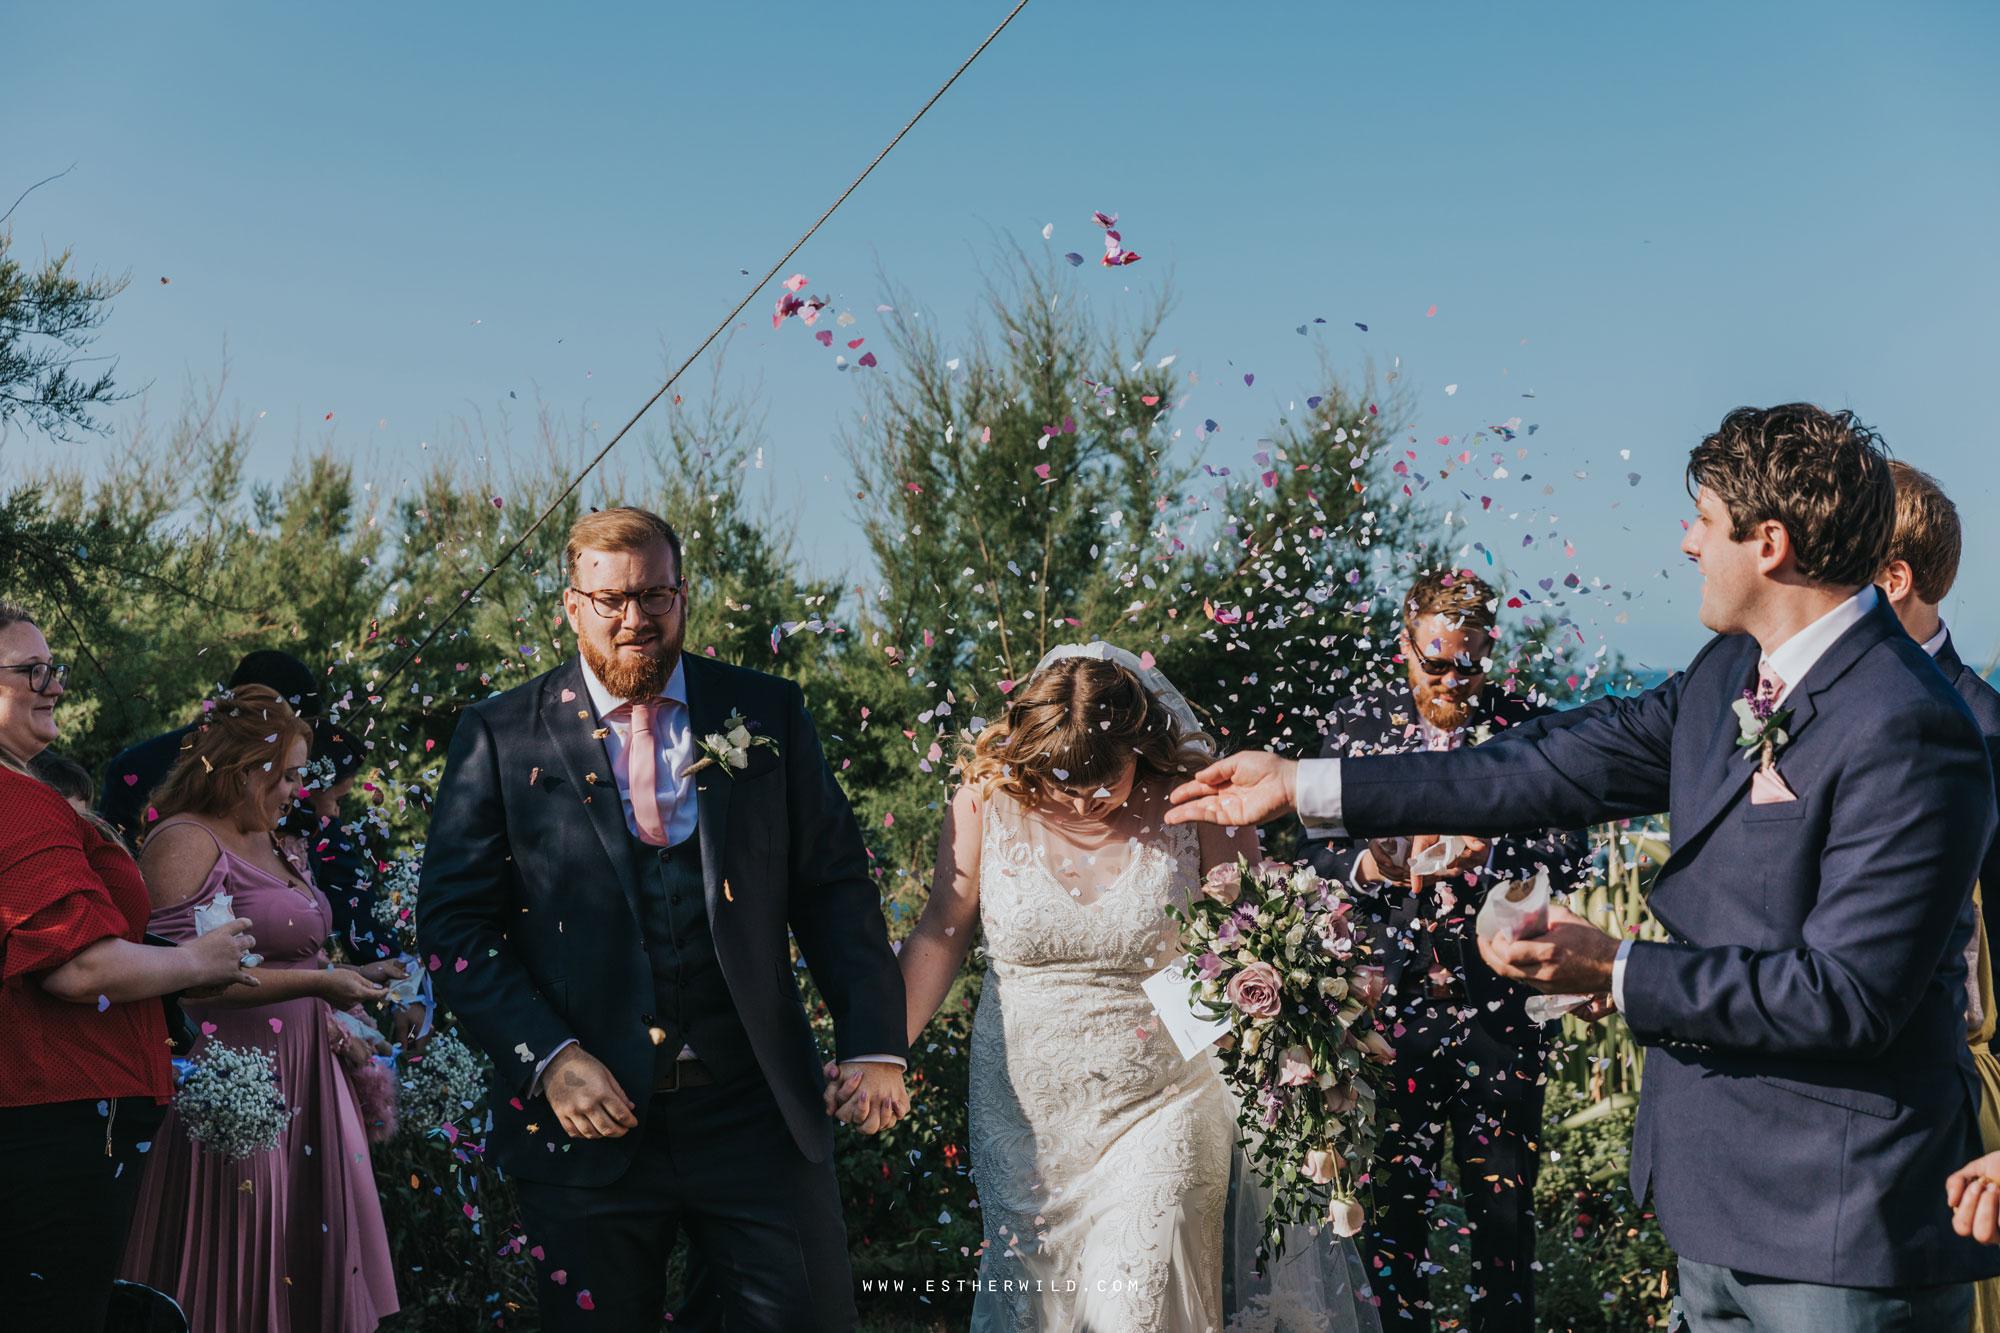 Cromer_Wedding_Beach_Outdoor_Ceremony_Norfolk_North_Lodge_Registry_Office_Rocket_House_Cafe_Cromer_Pier_IMG_4117.jpg